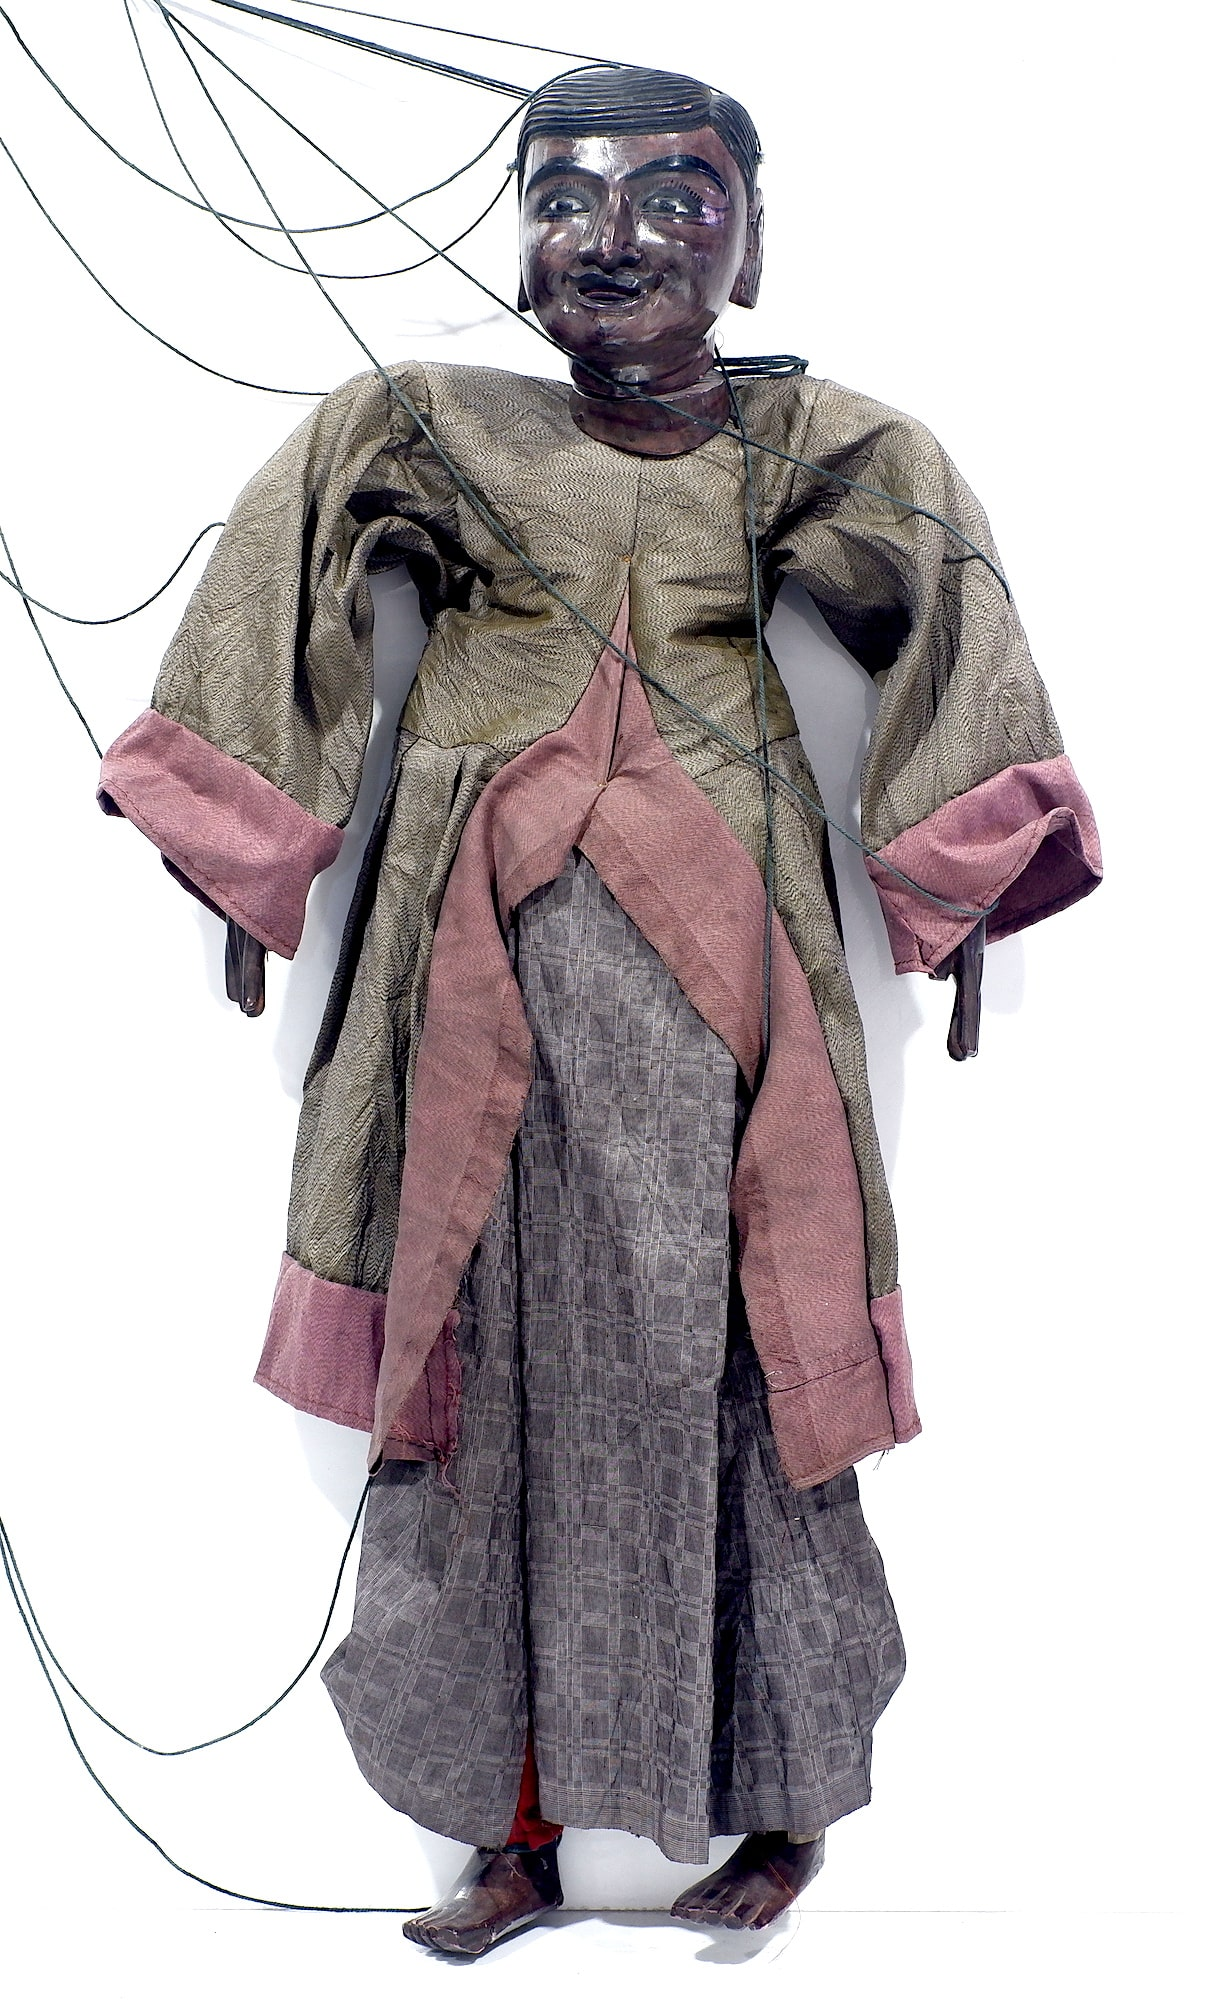 'Old Burmese Marionette Puppet'